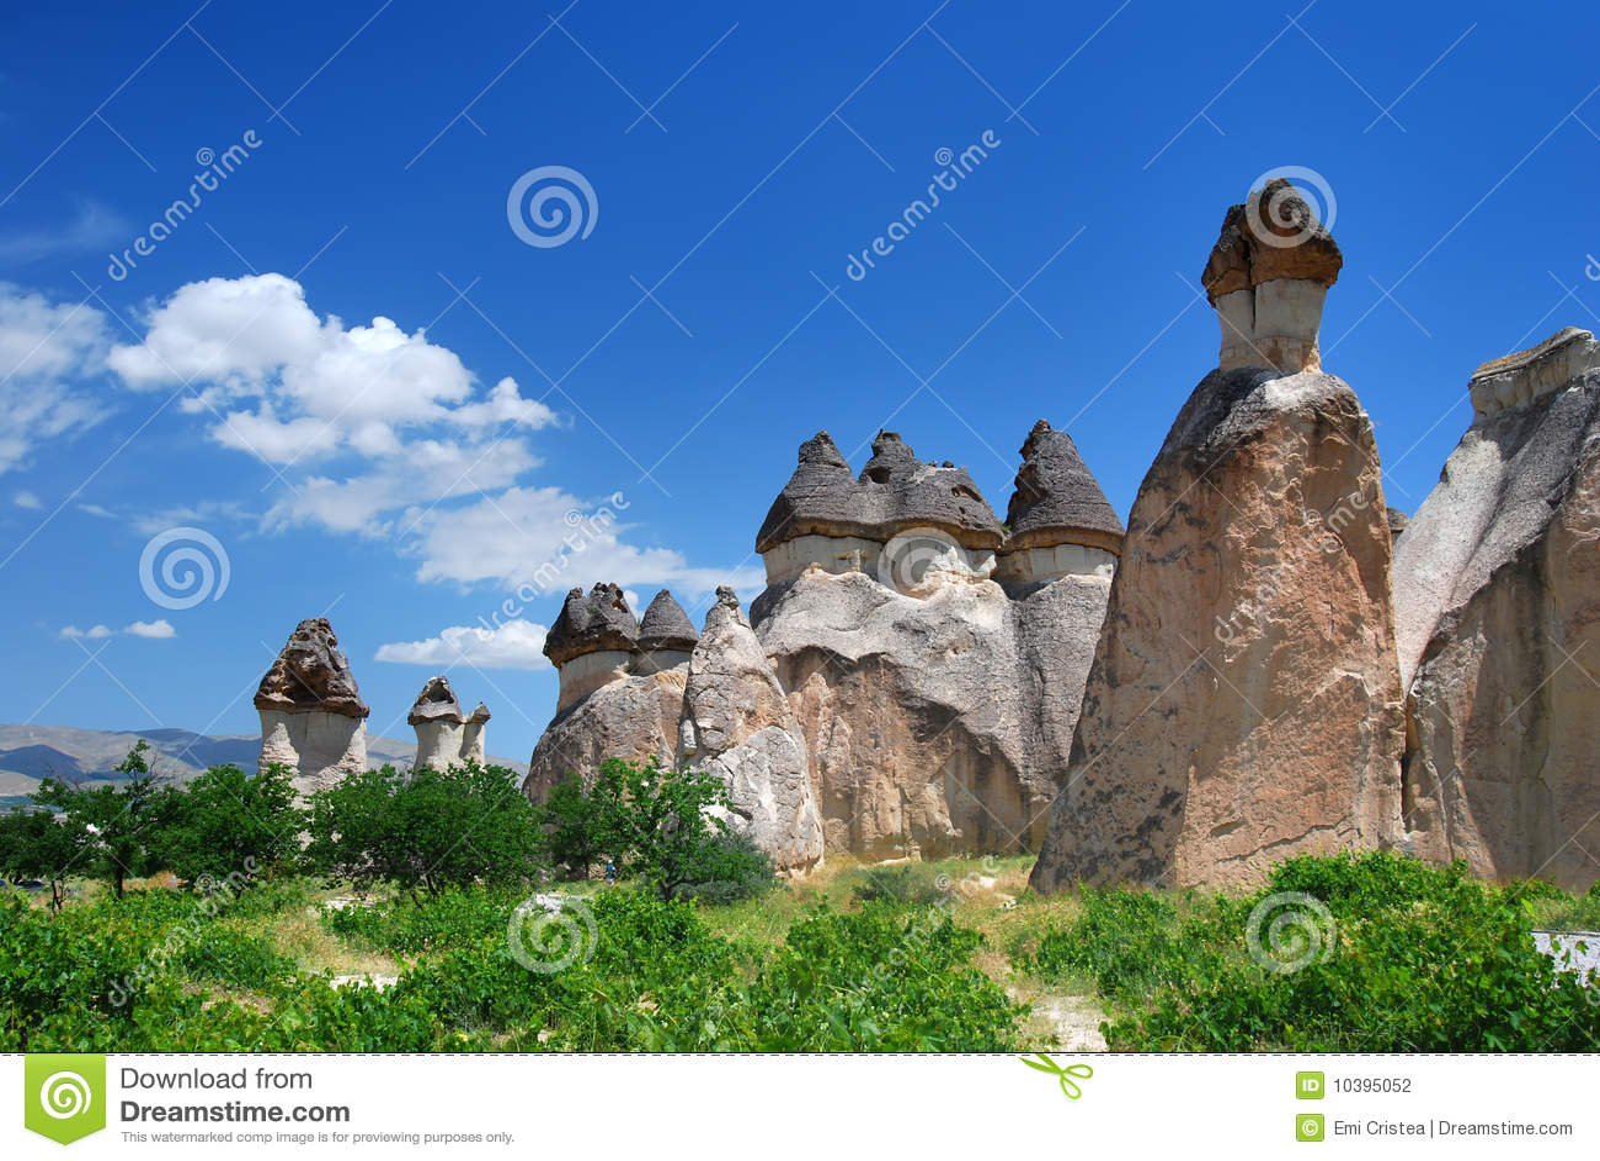 Pasa Baglari in Cappadocia